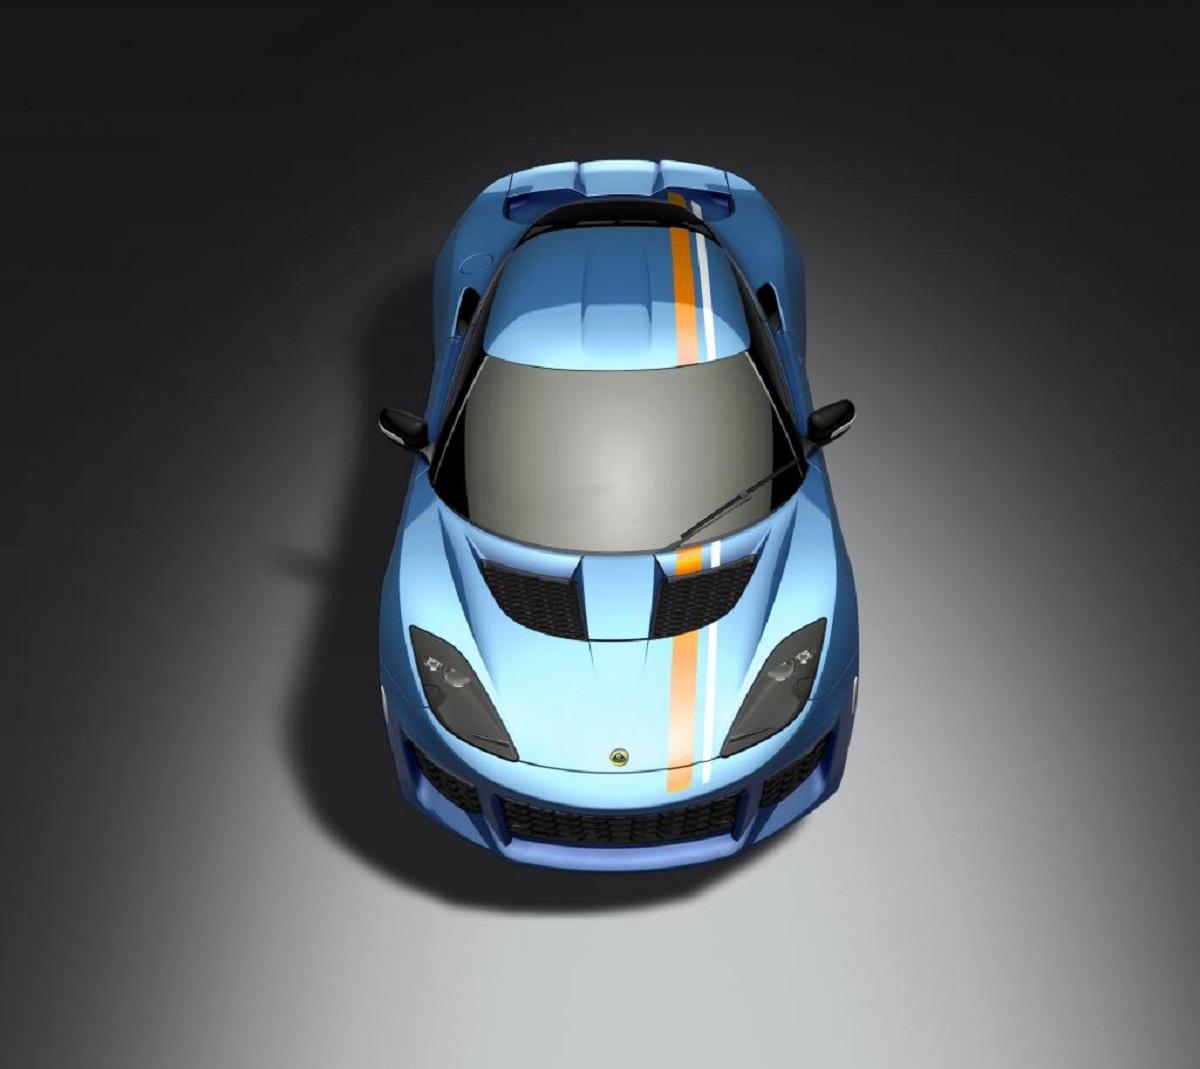 46580_Lotus-Evora-400-Blue-&-Orange-Edition-2_1024x913.jpg